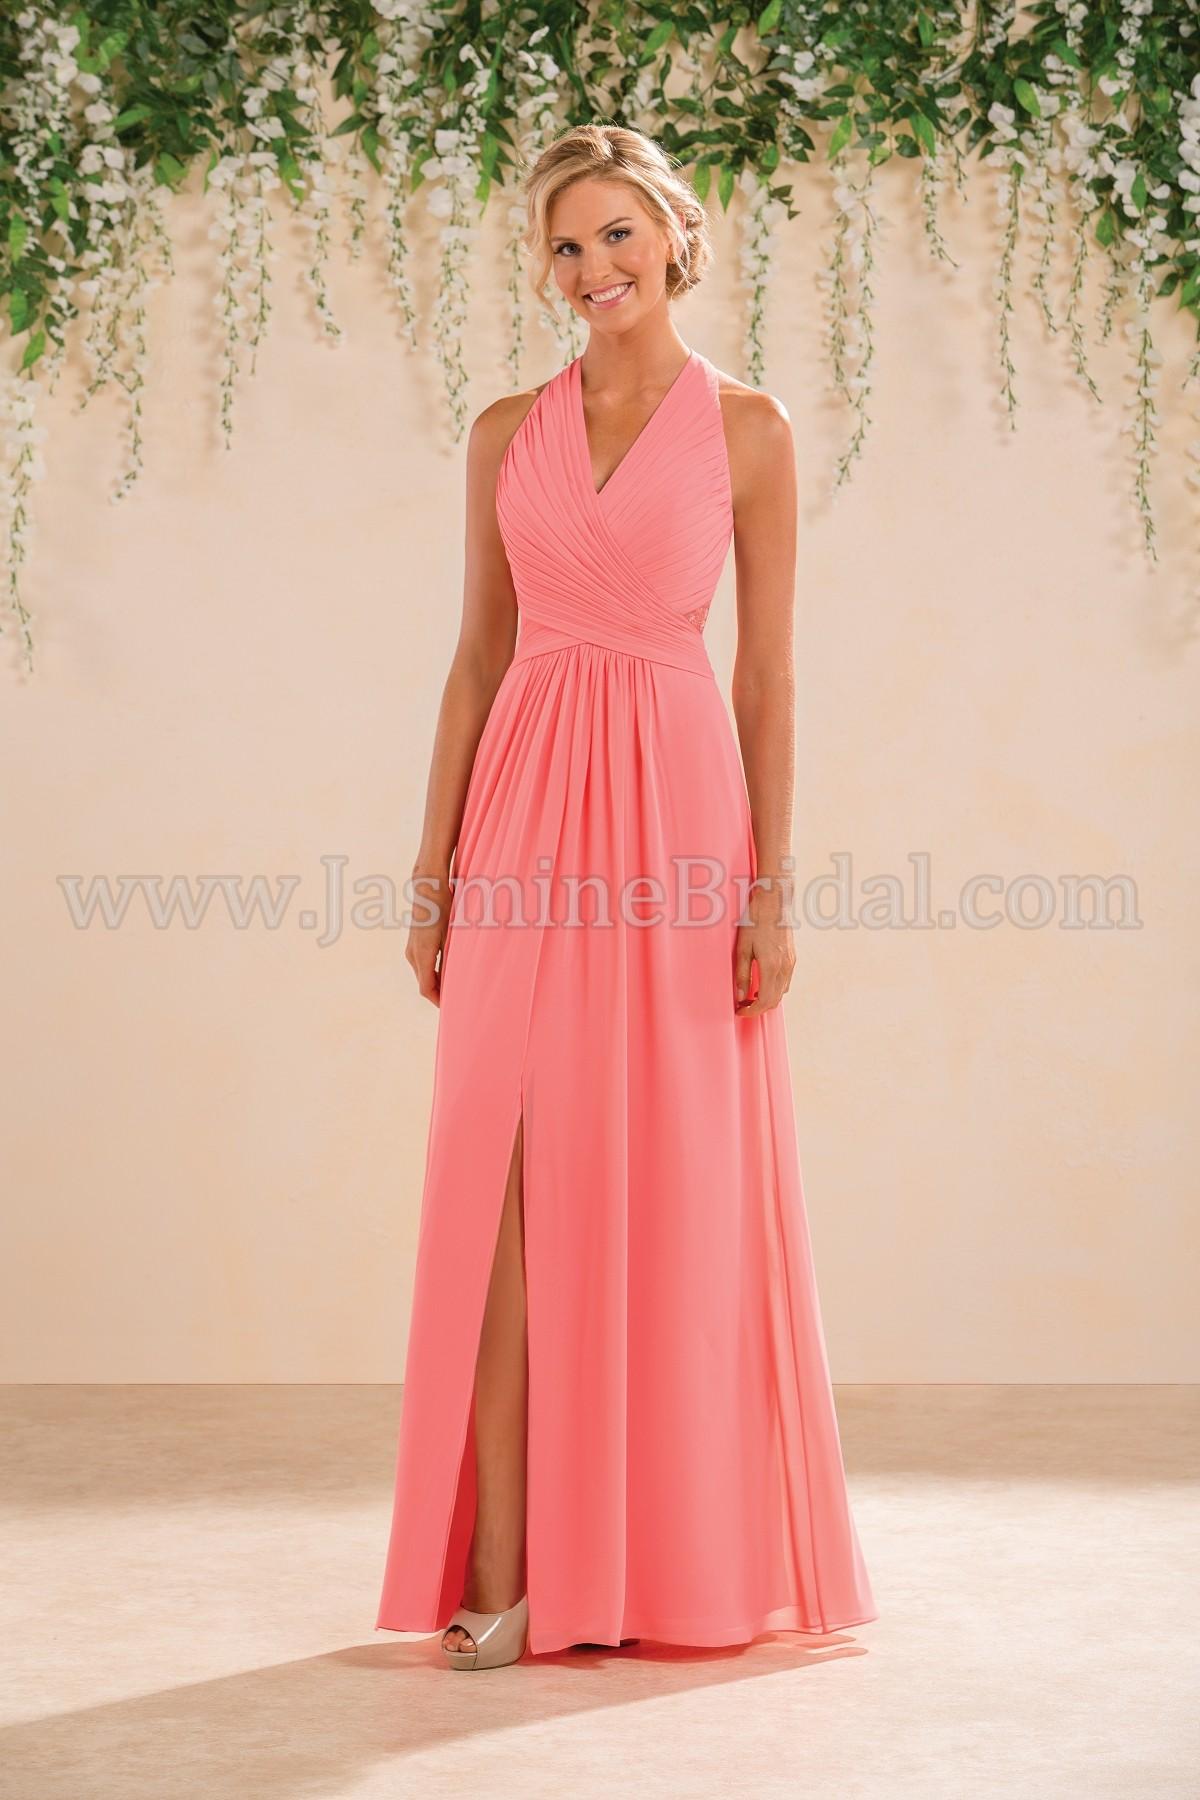 B183008 Long V-neck Poly Chiffon Bridesmaid Dress with Slit